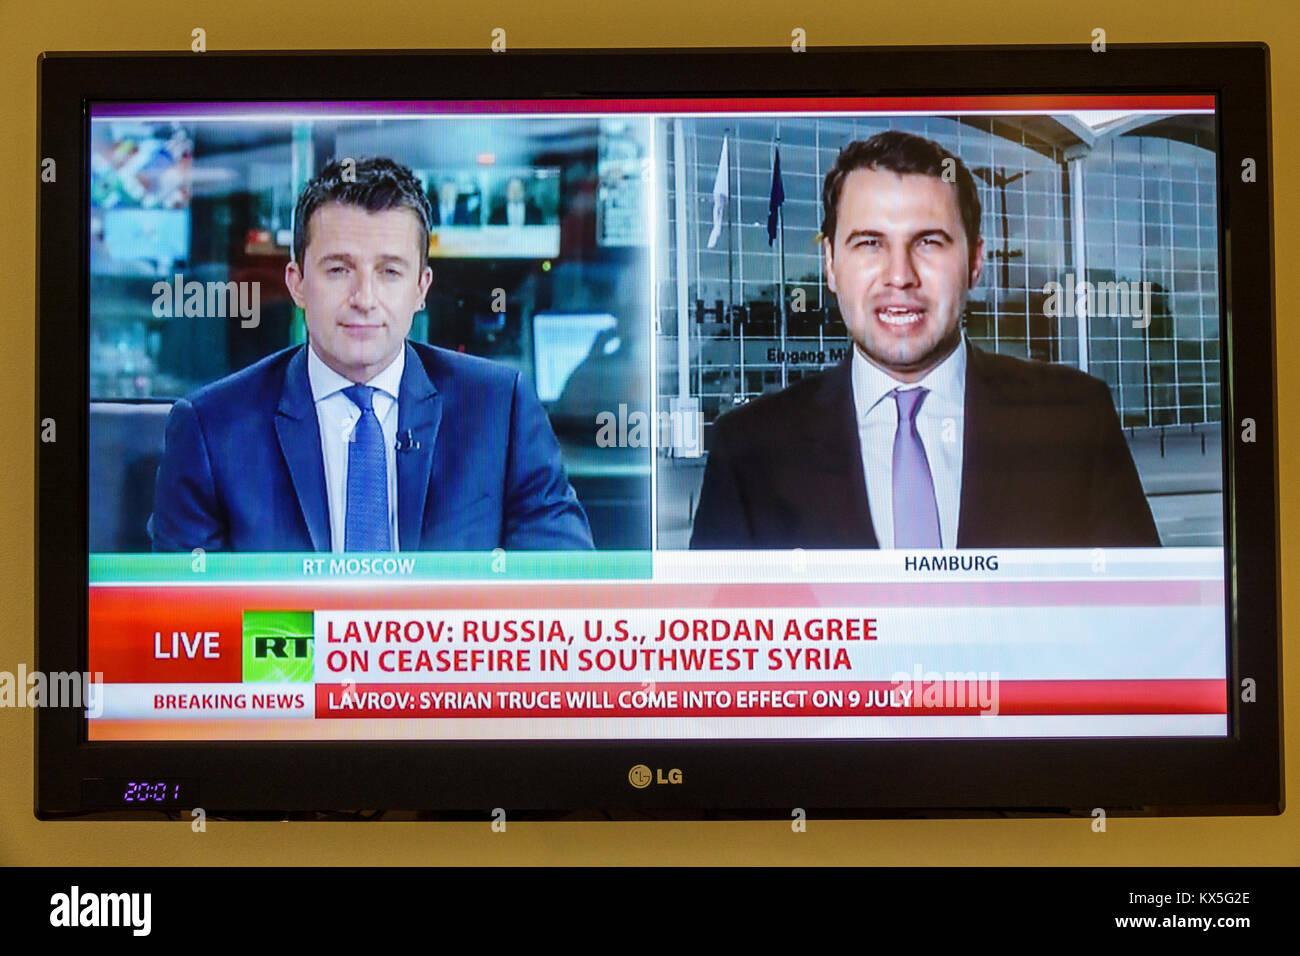 Porto Portugal pantalla de televisión tv flat panel monitor RT Rusia hoy noticias programa de canal alto el Imagen De Stock